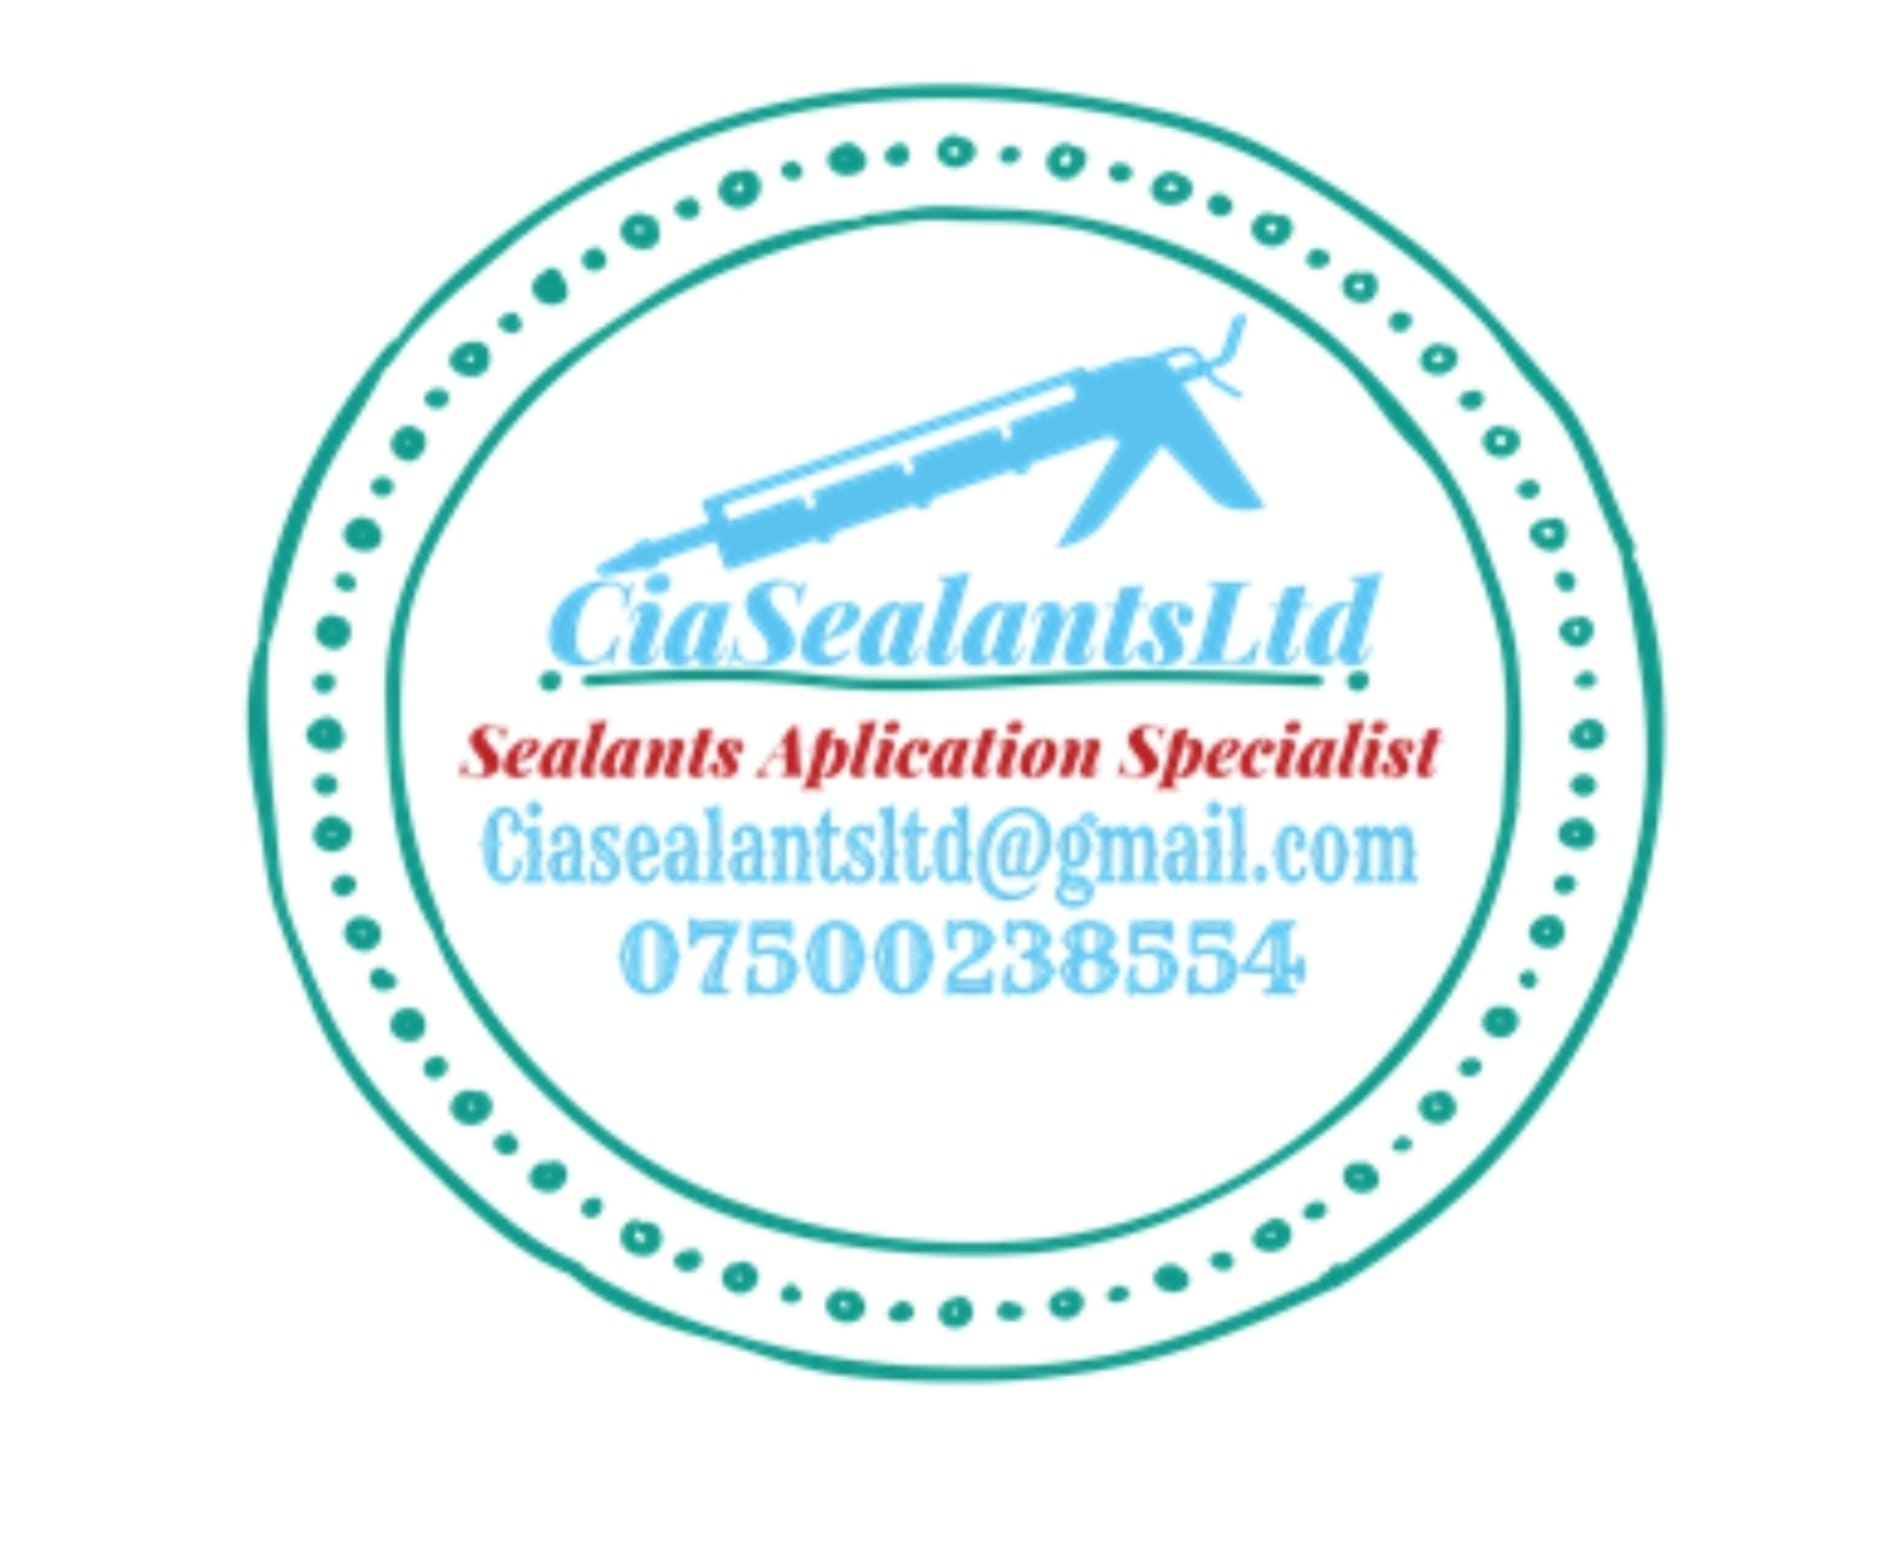 Cia Sealants Ltd